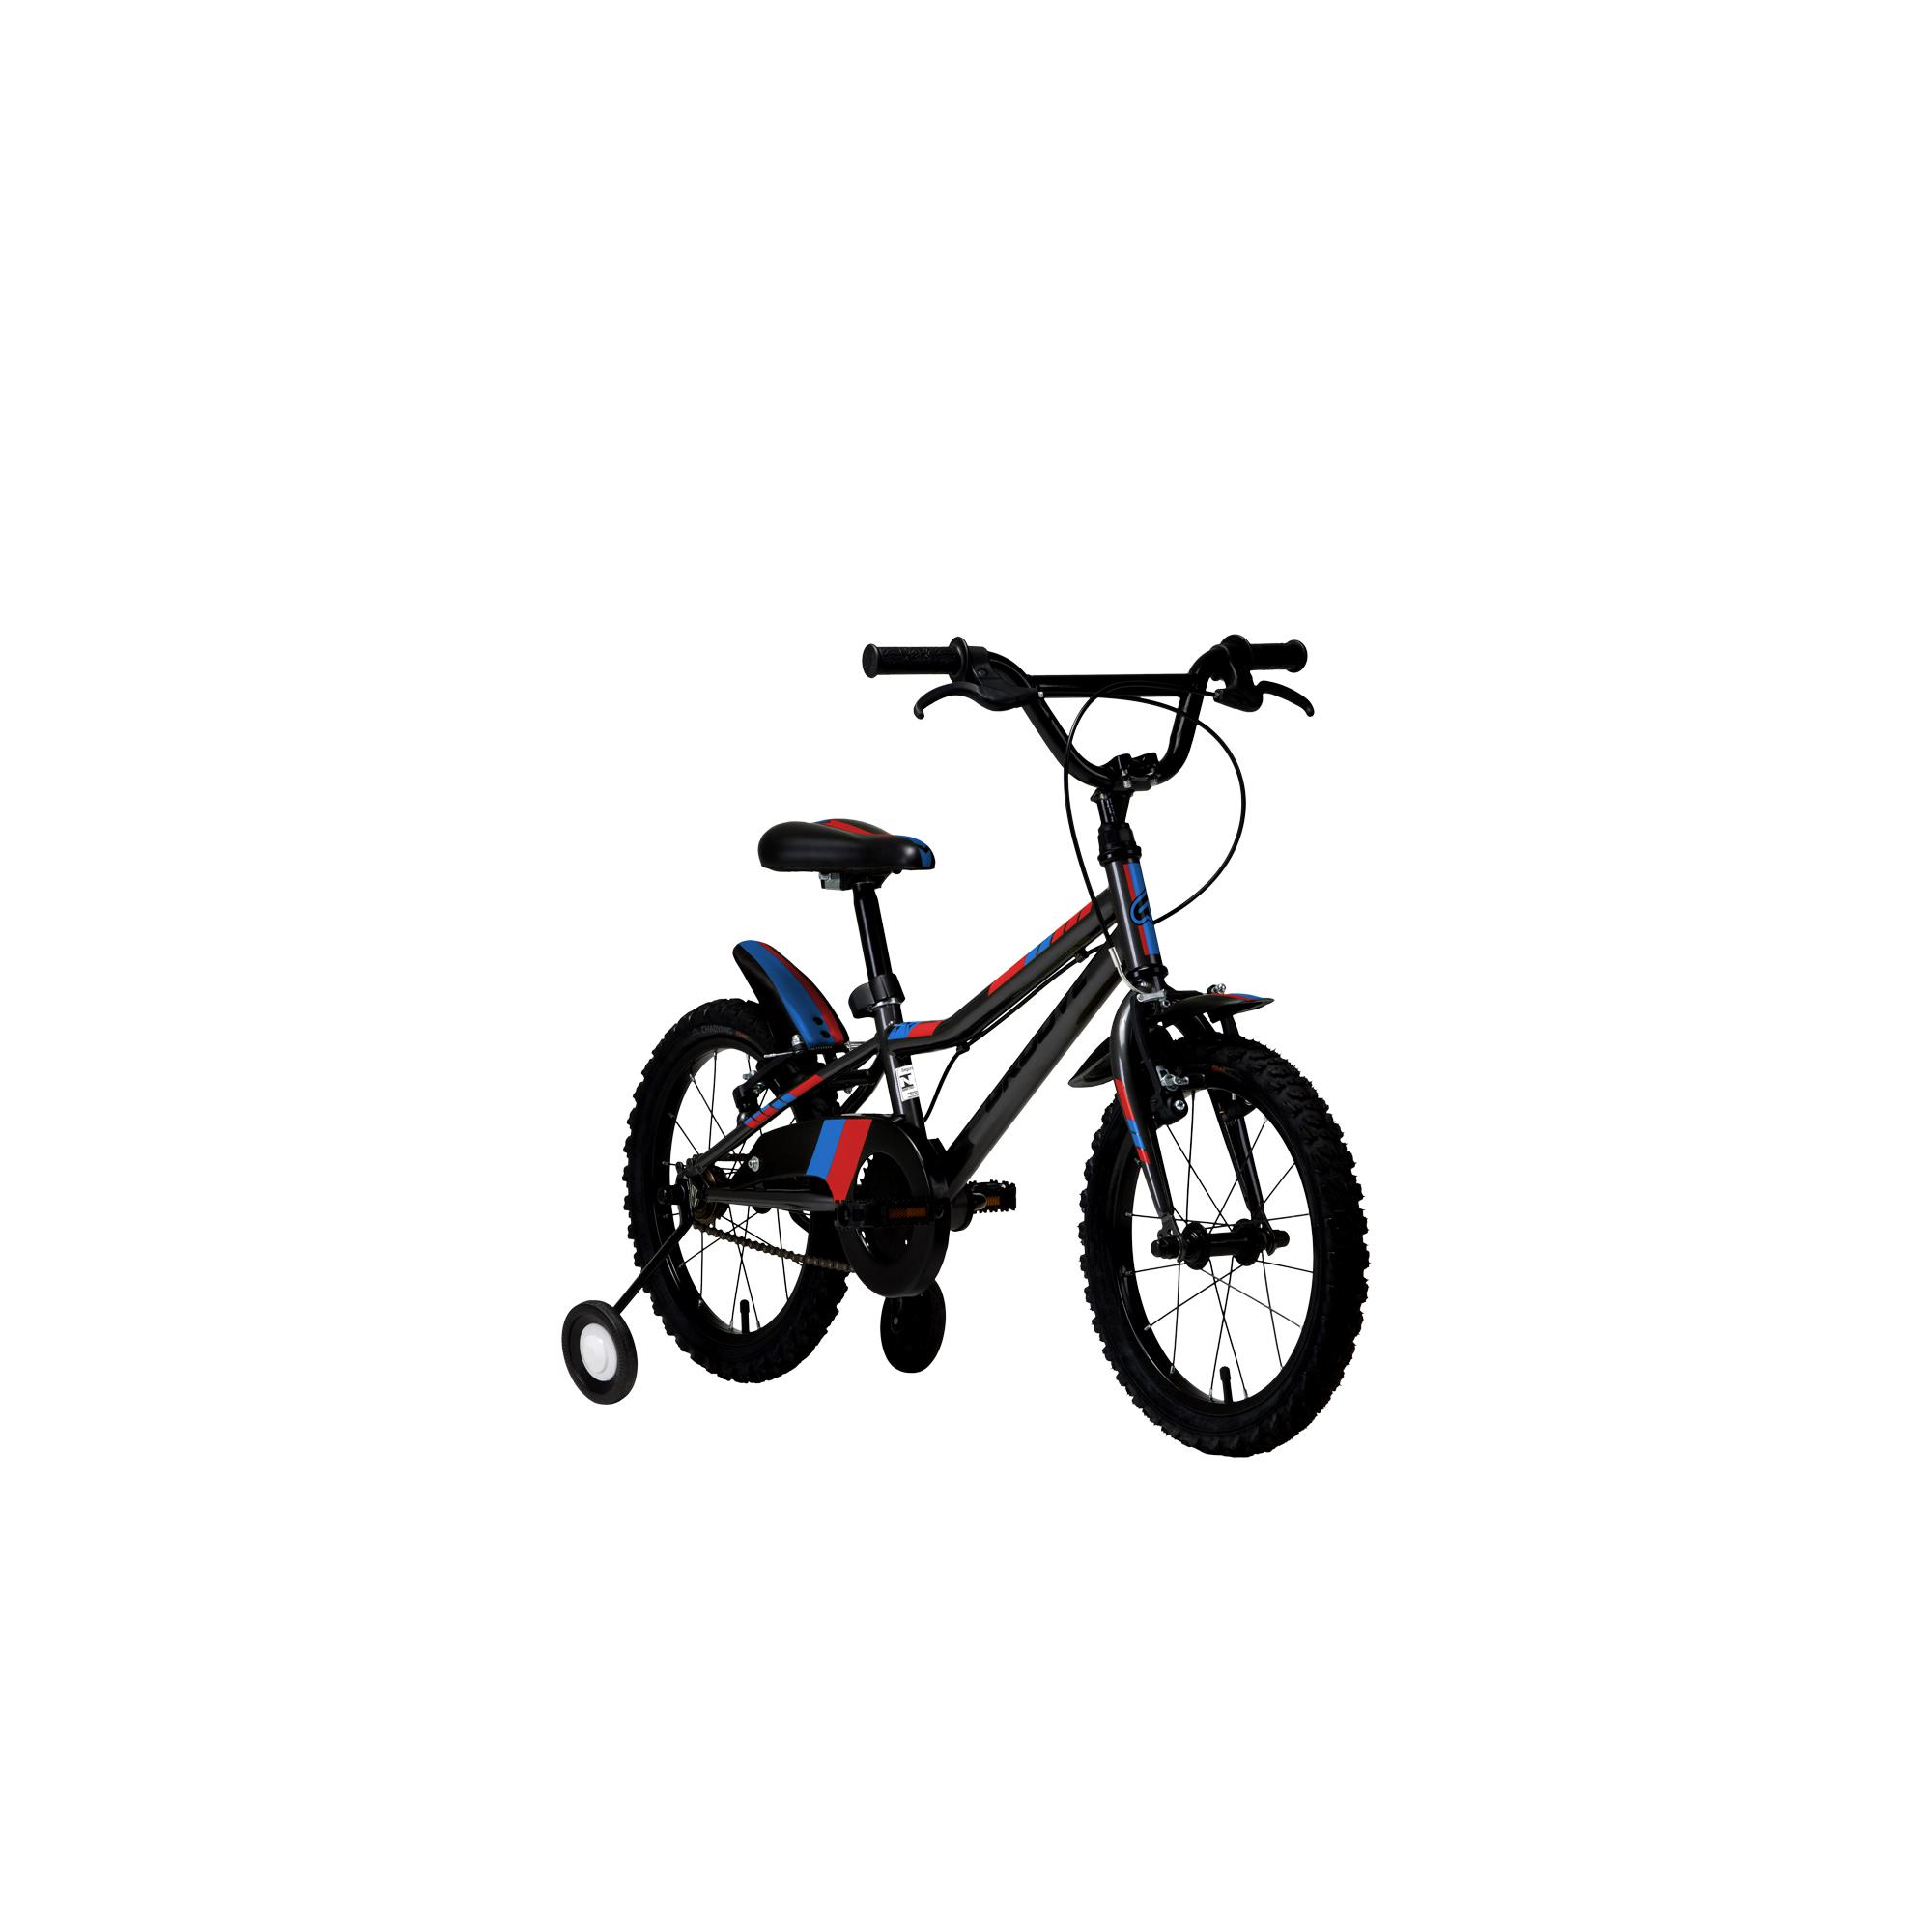 bicicleta-infantil-groove-ragga-16-01